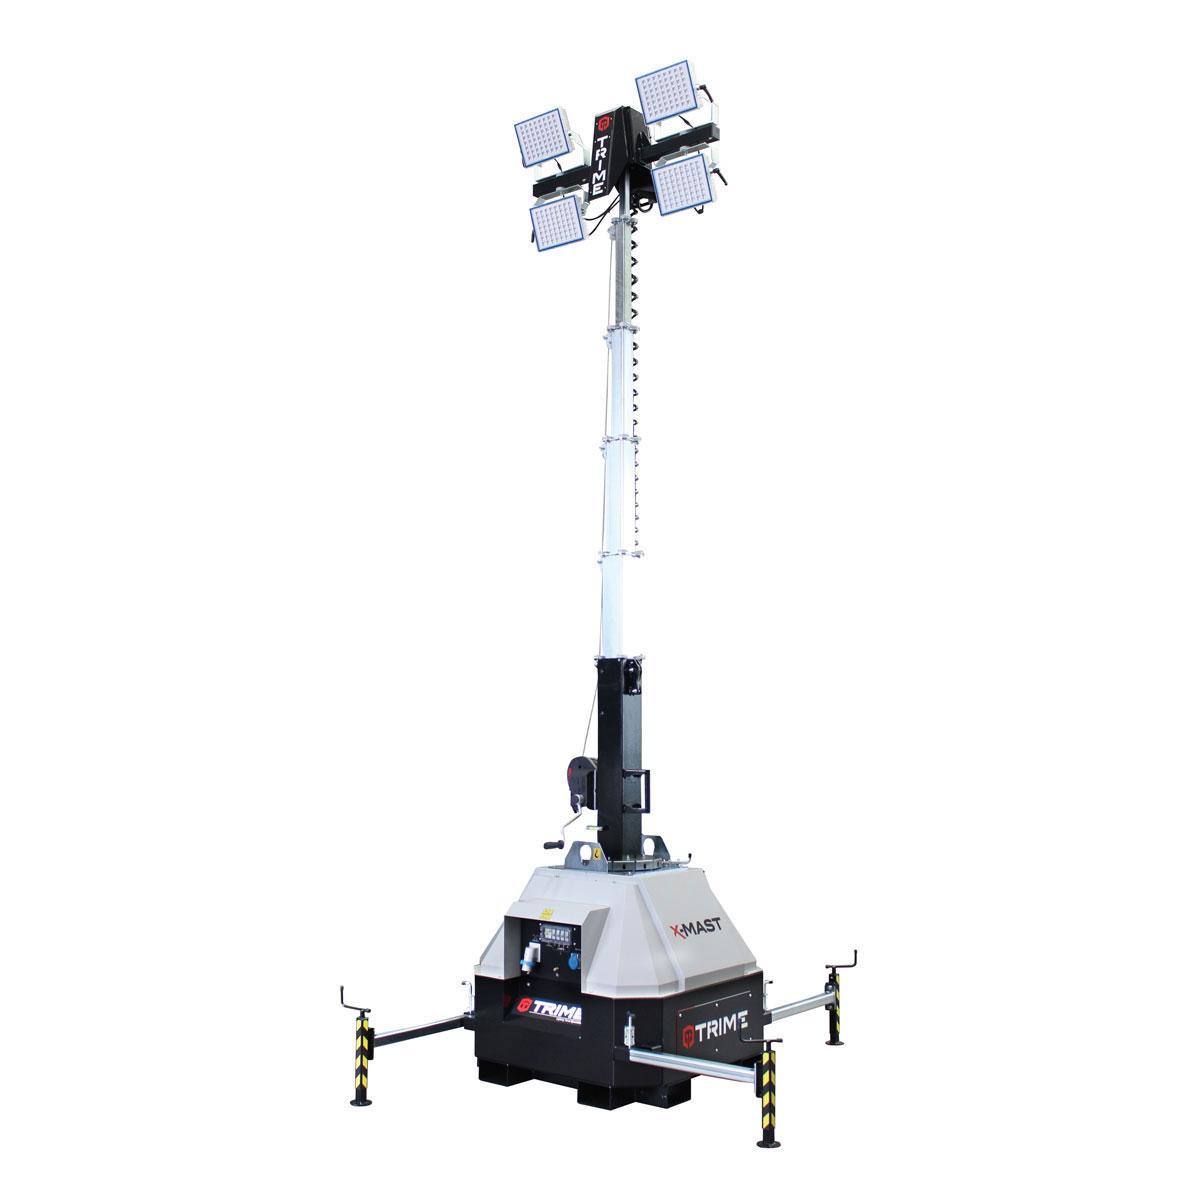 prozektoru-masts-led-x-mast-4x150W-atverta-pozicija